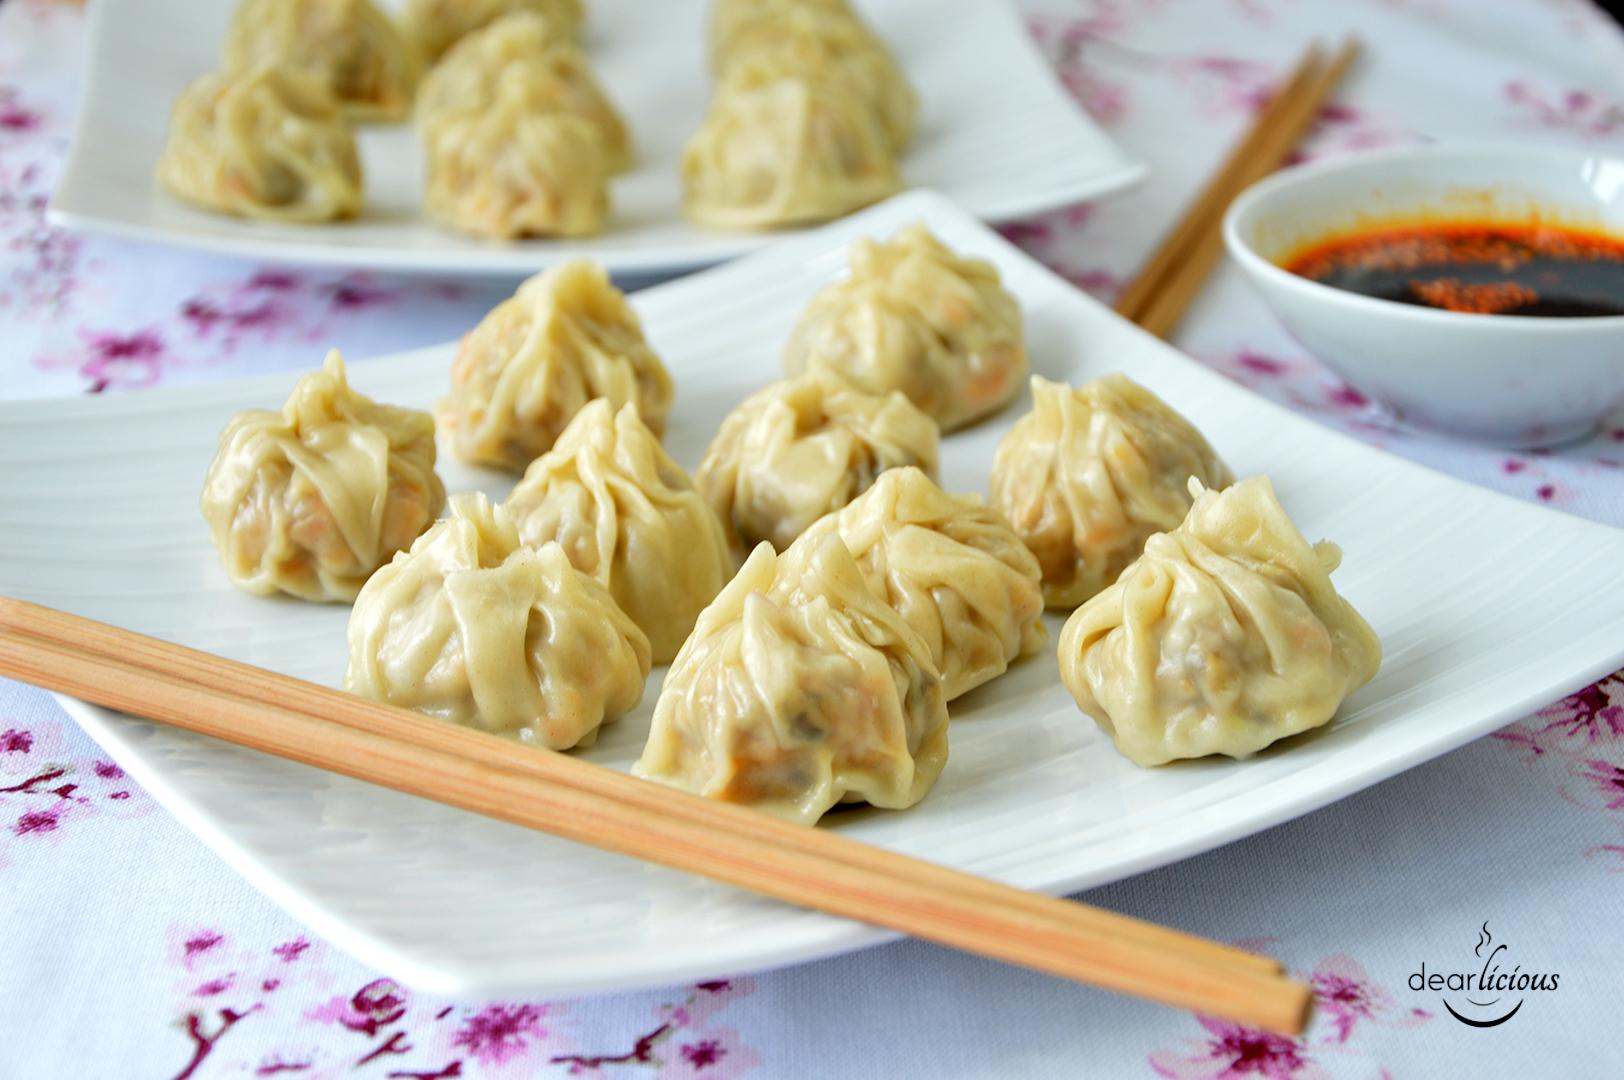 Rezept für Dumplings | Dearlicious